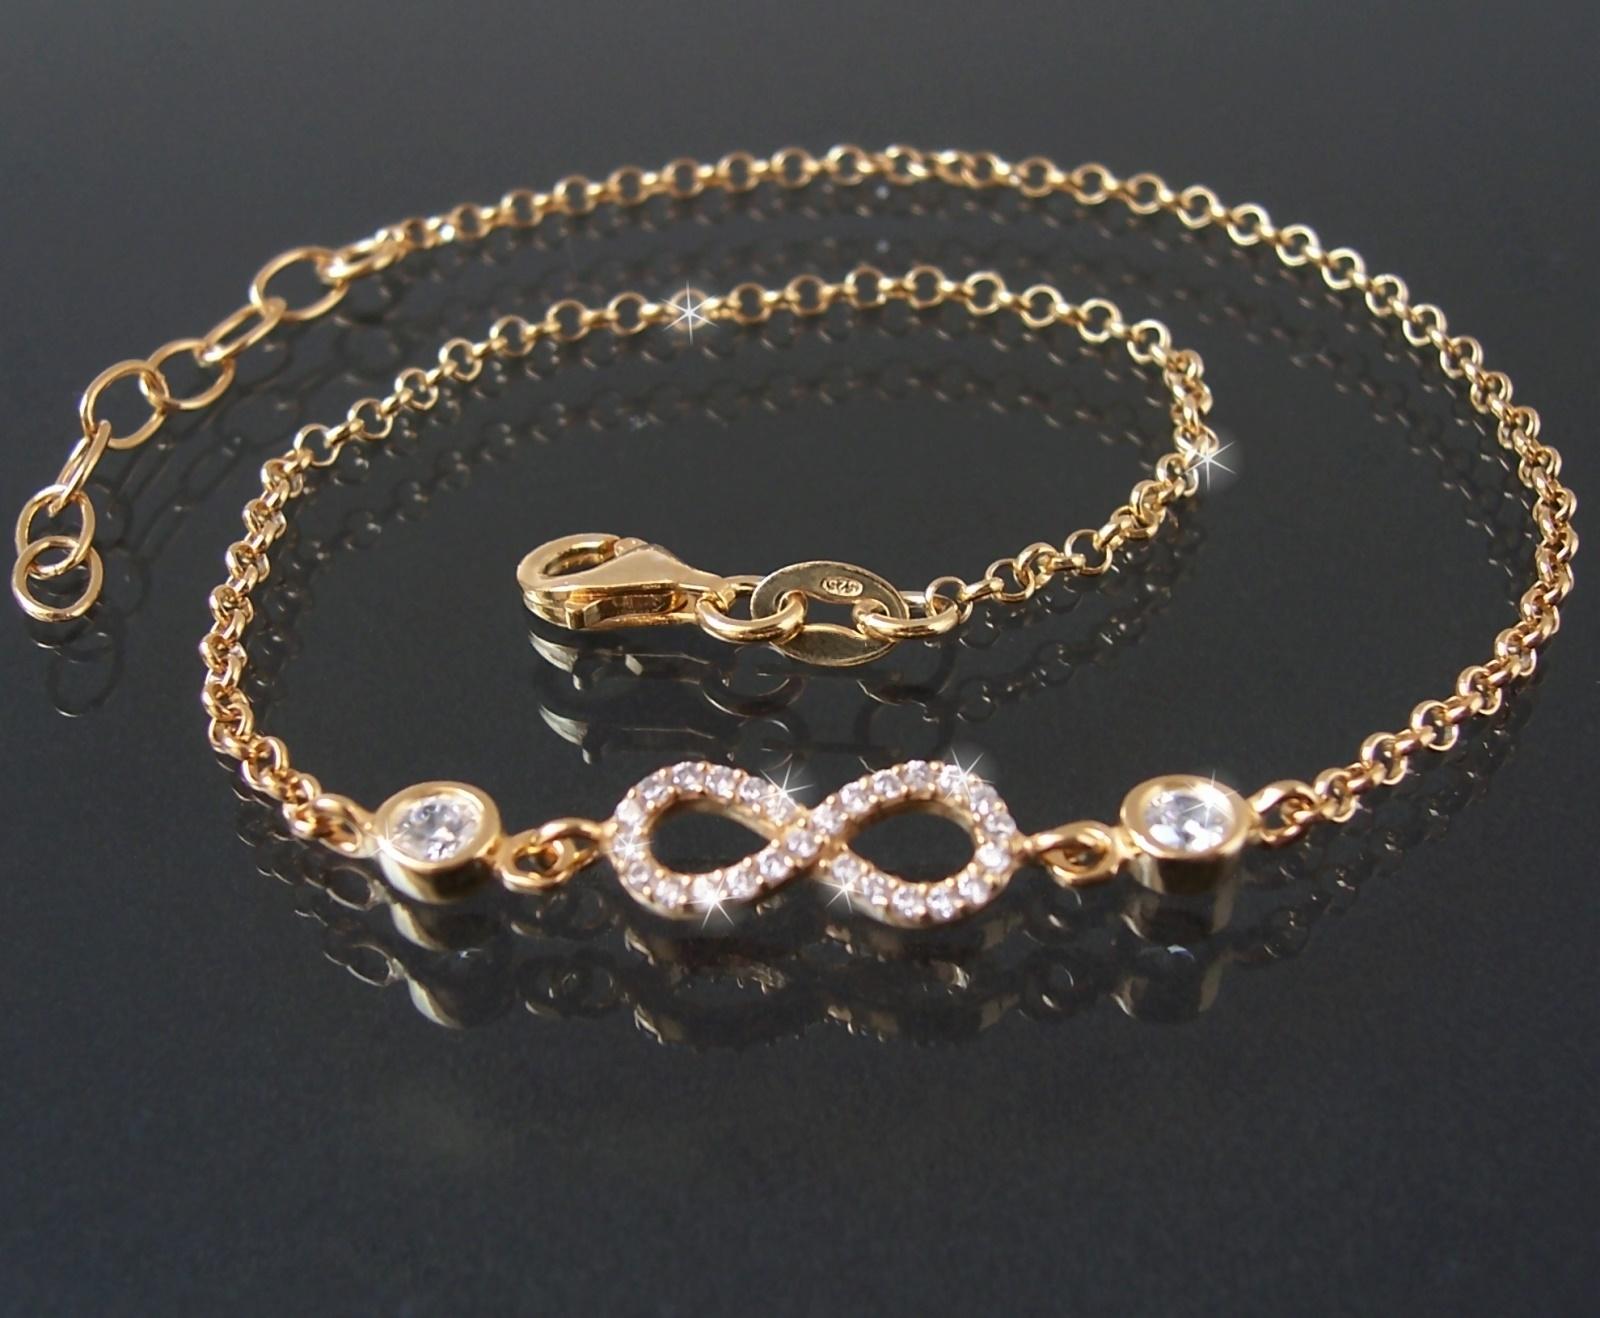 Fußkette Fuß Kette 925 Silber Gold 24-27cm Infinity Zirkonia 23020G-27